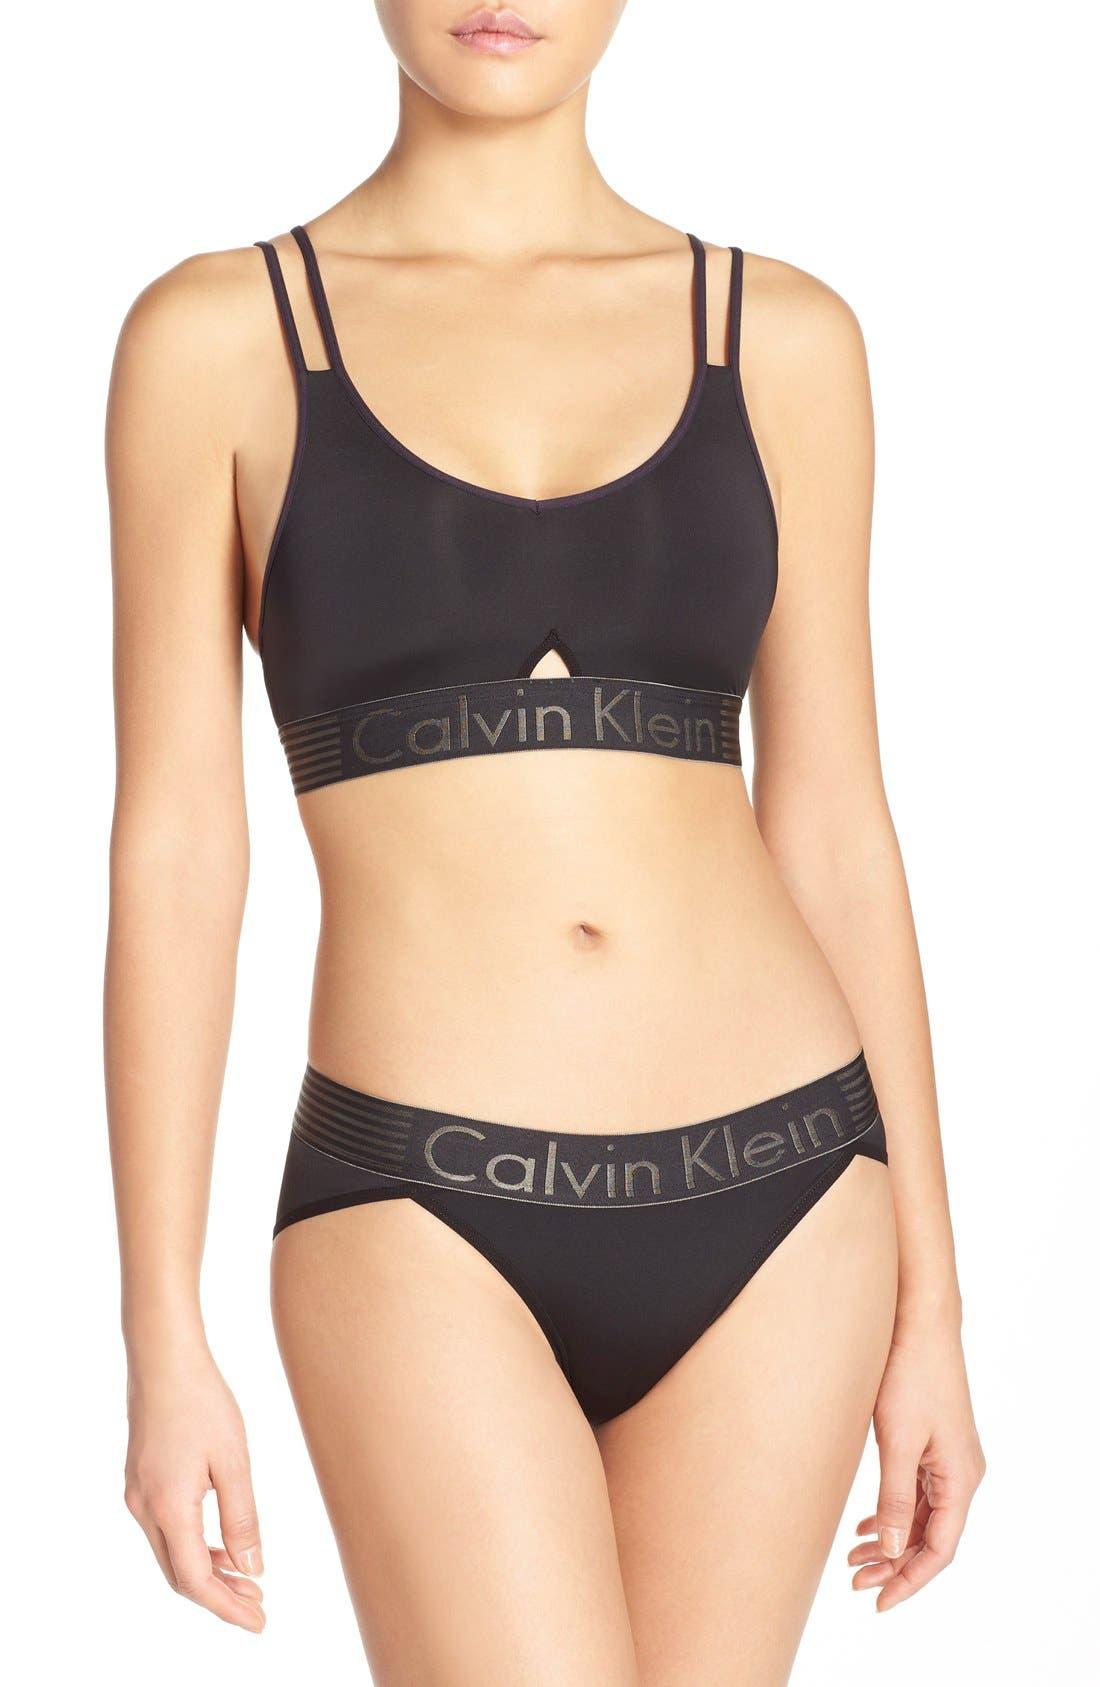 Calvin Klein 'Iron Strength' Bralette & Bikini